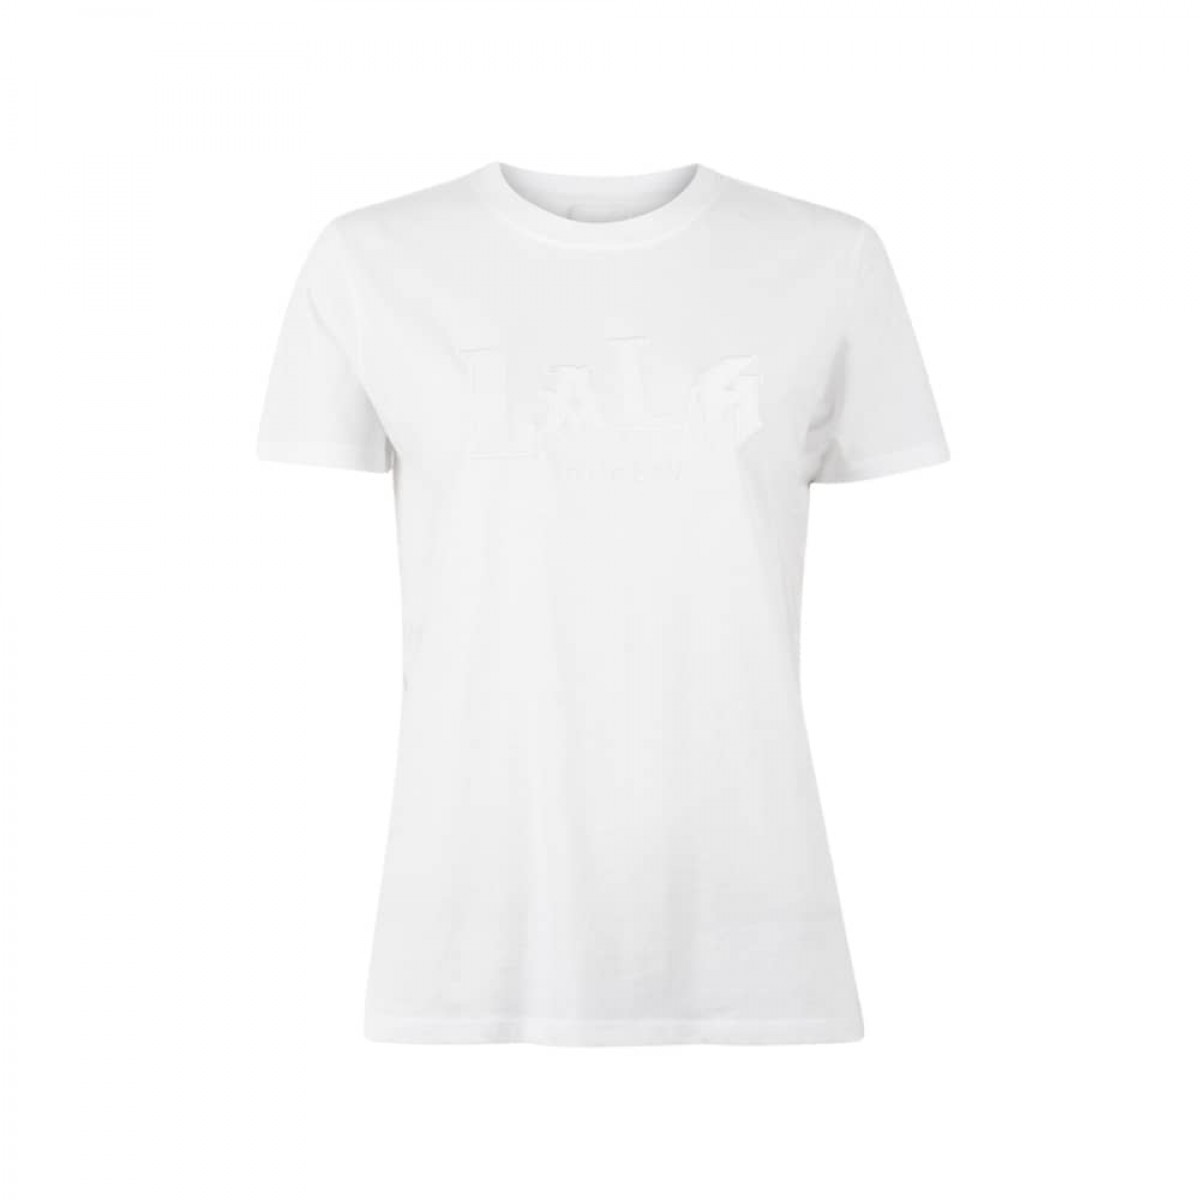 t-shirt reda lala mix - white - front